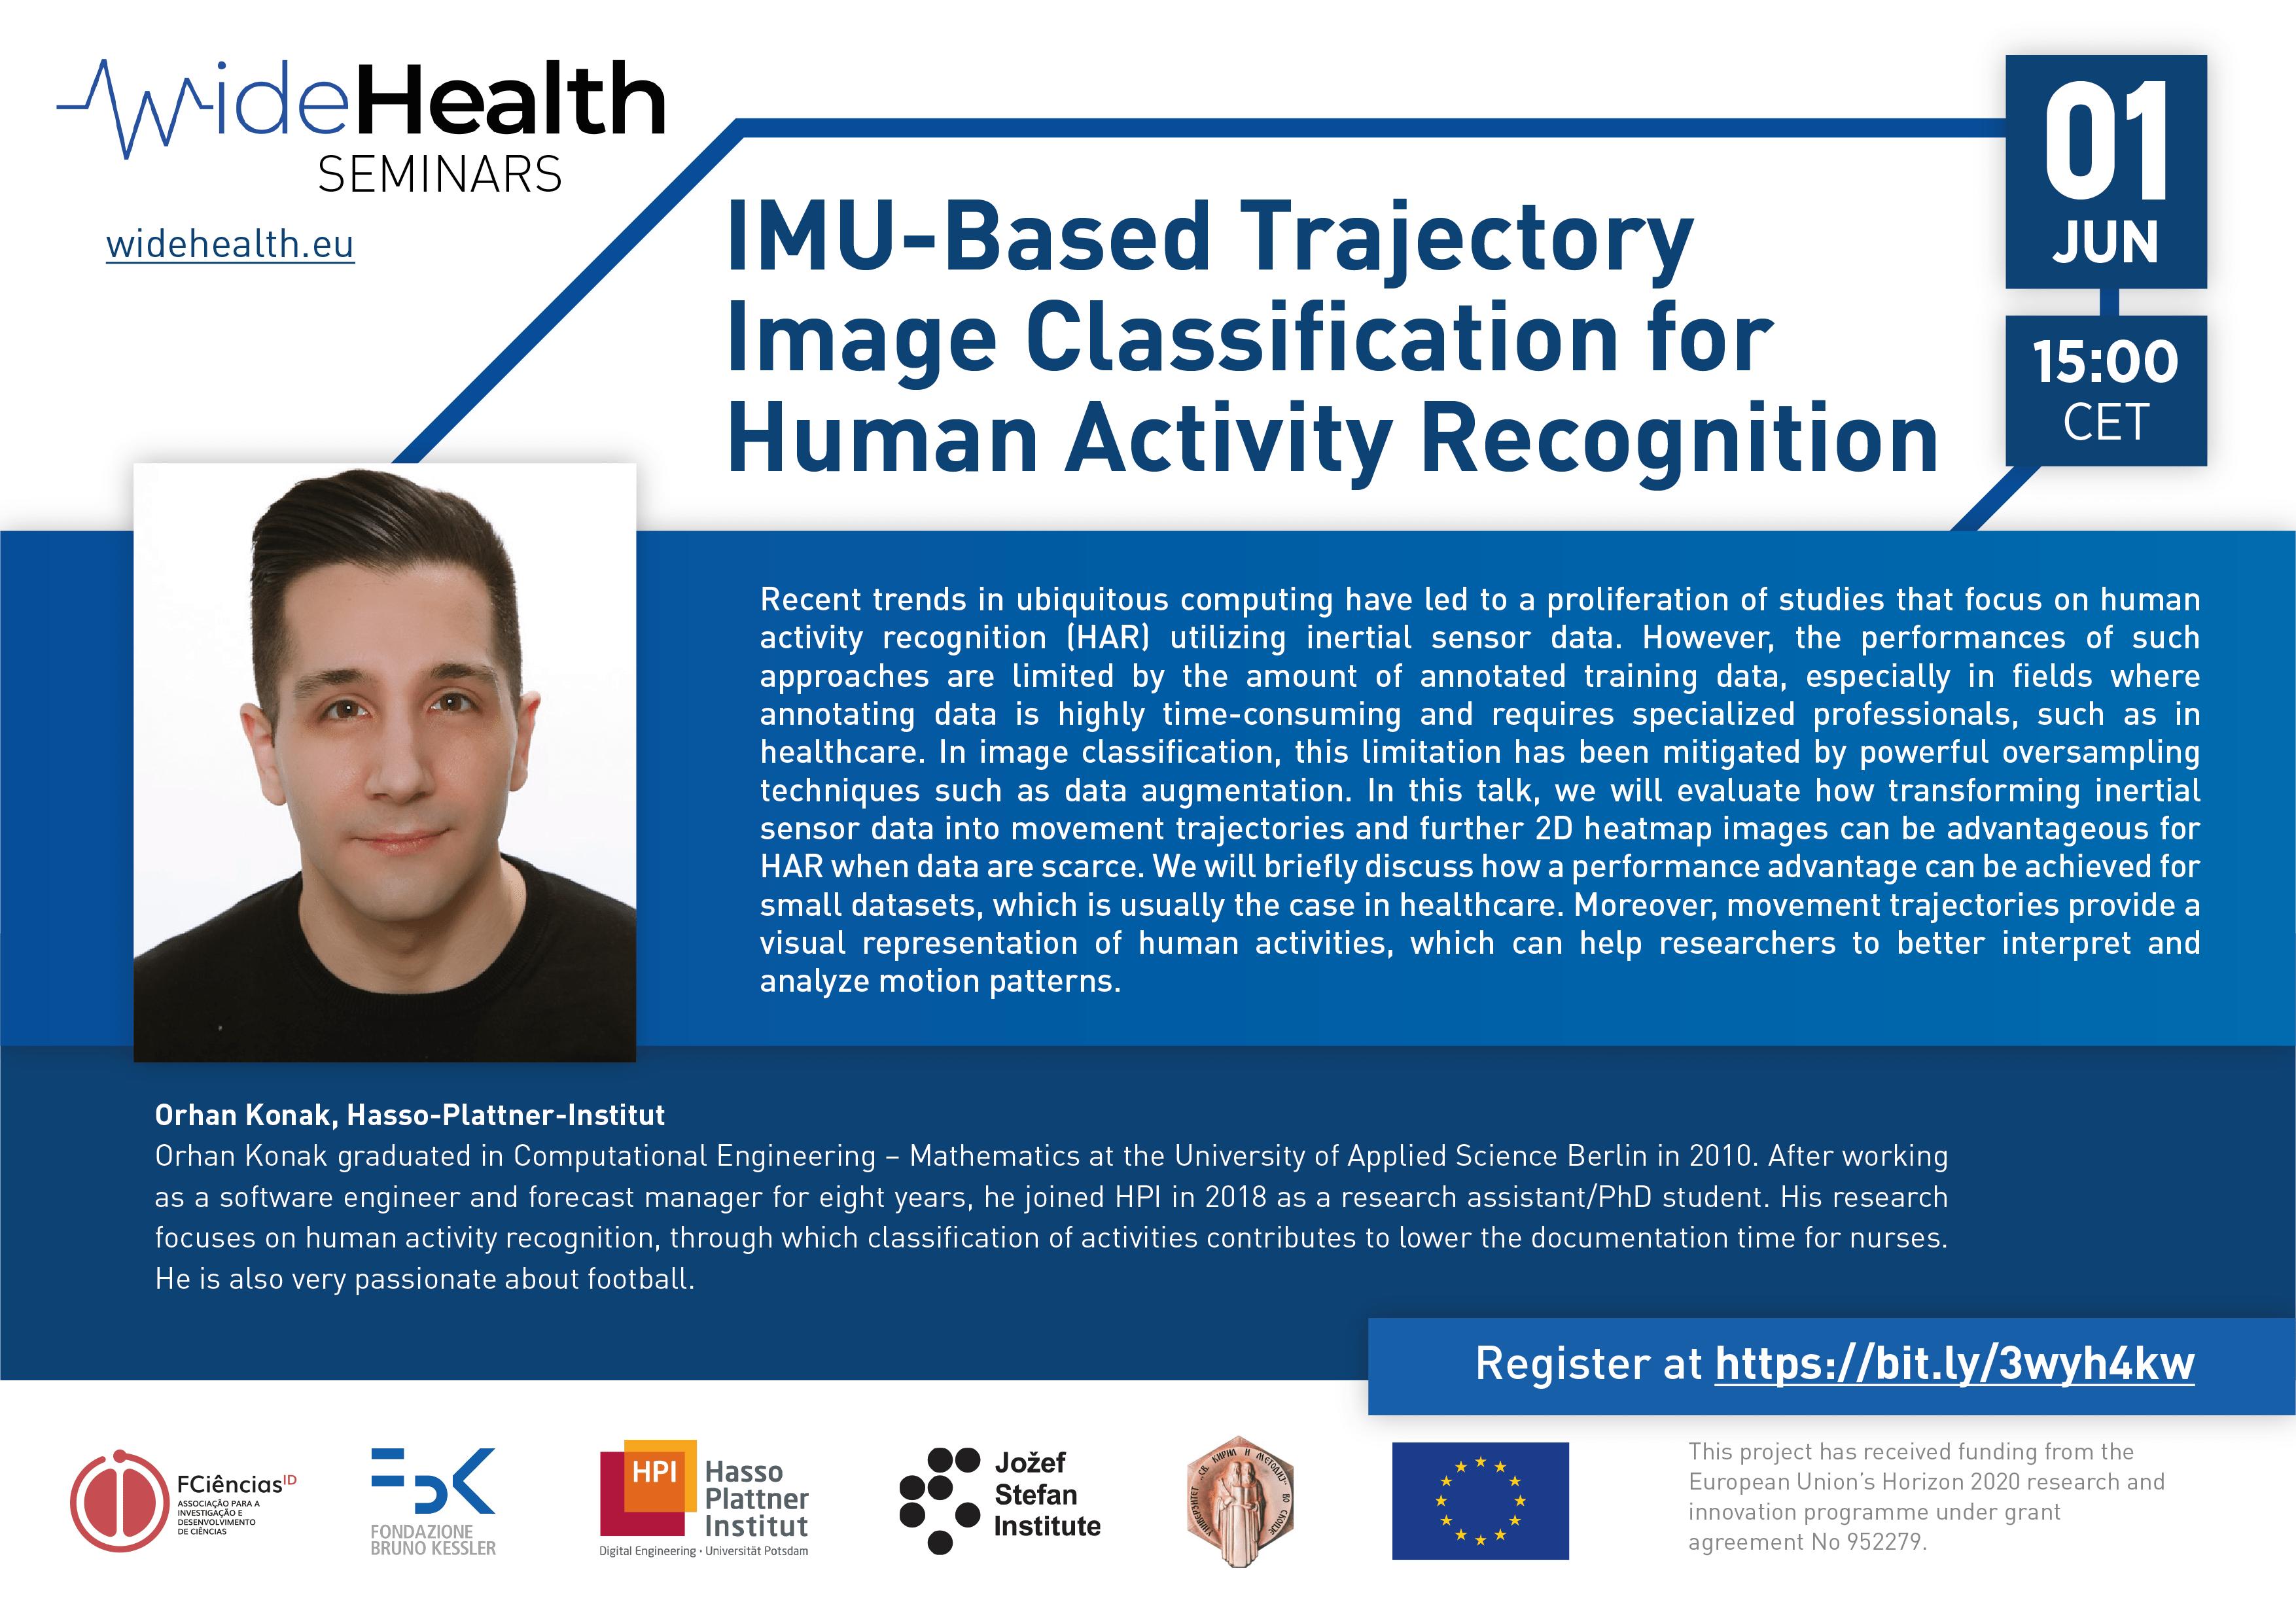 3rd WideHealth Seminar: Orhan Konak